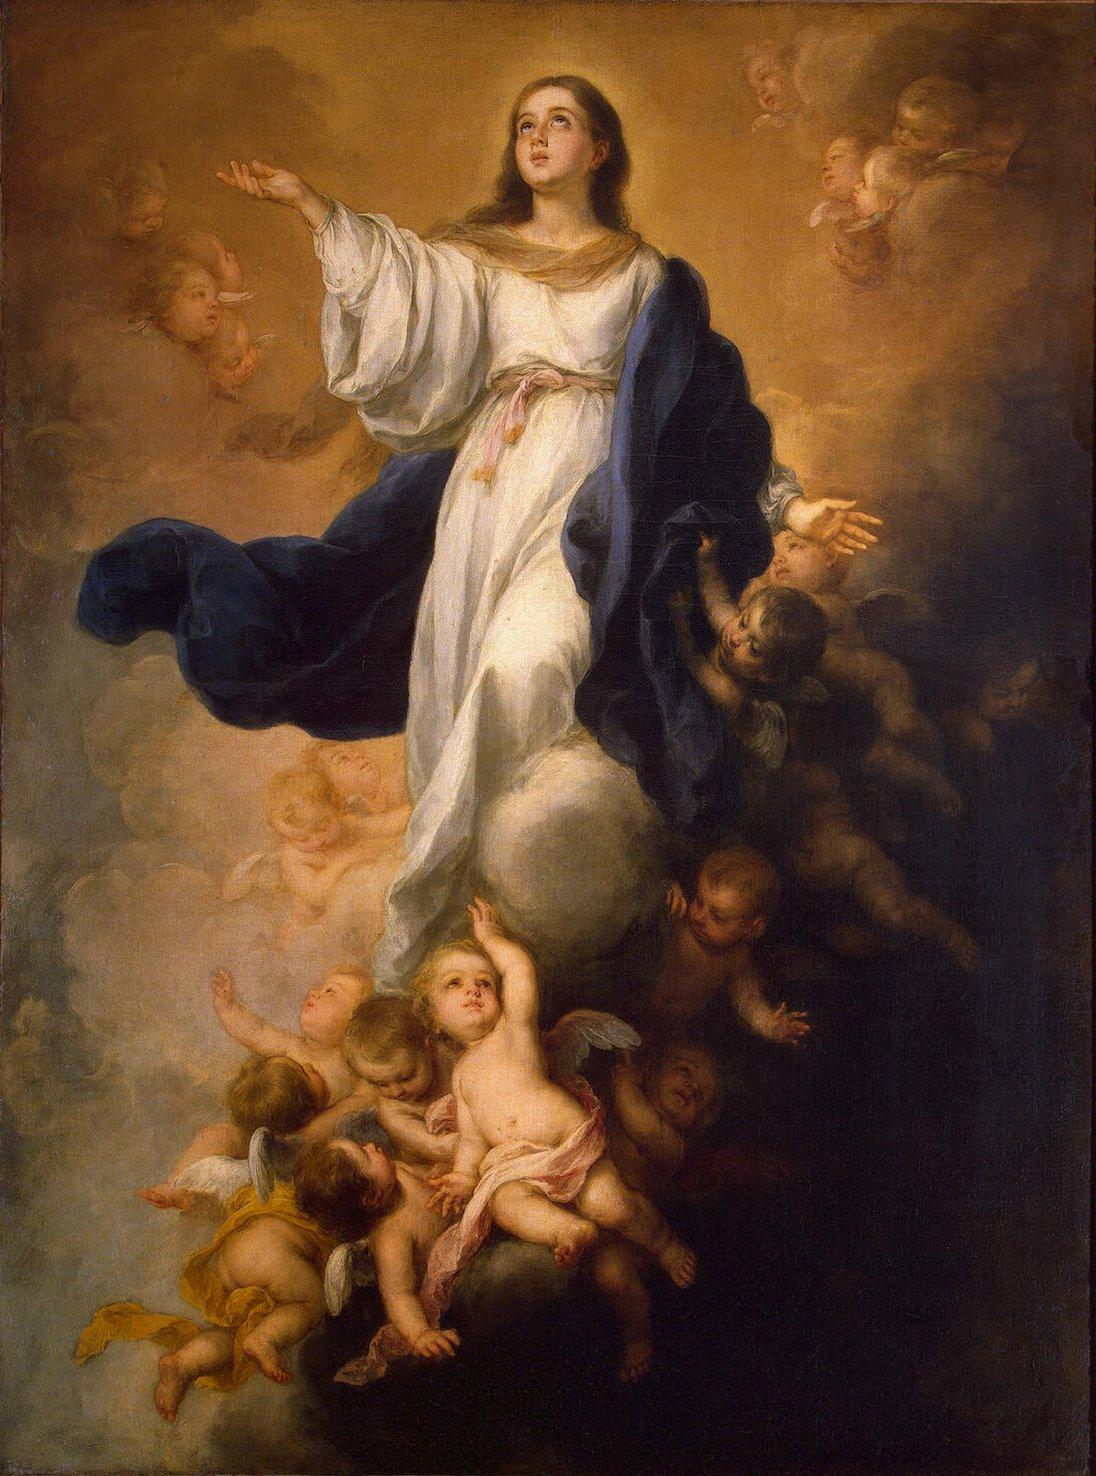 [Obrazek: the-assumption-of-the-virgin-1670.jpg]